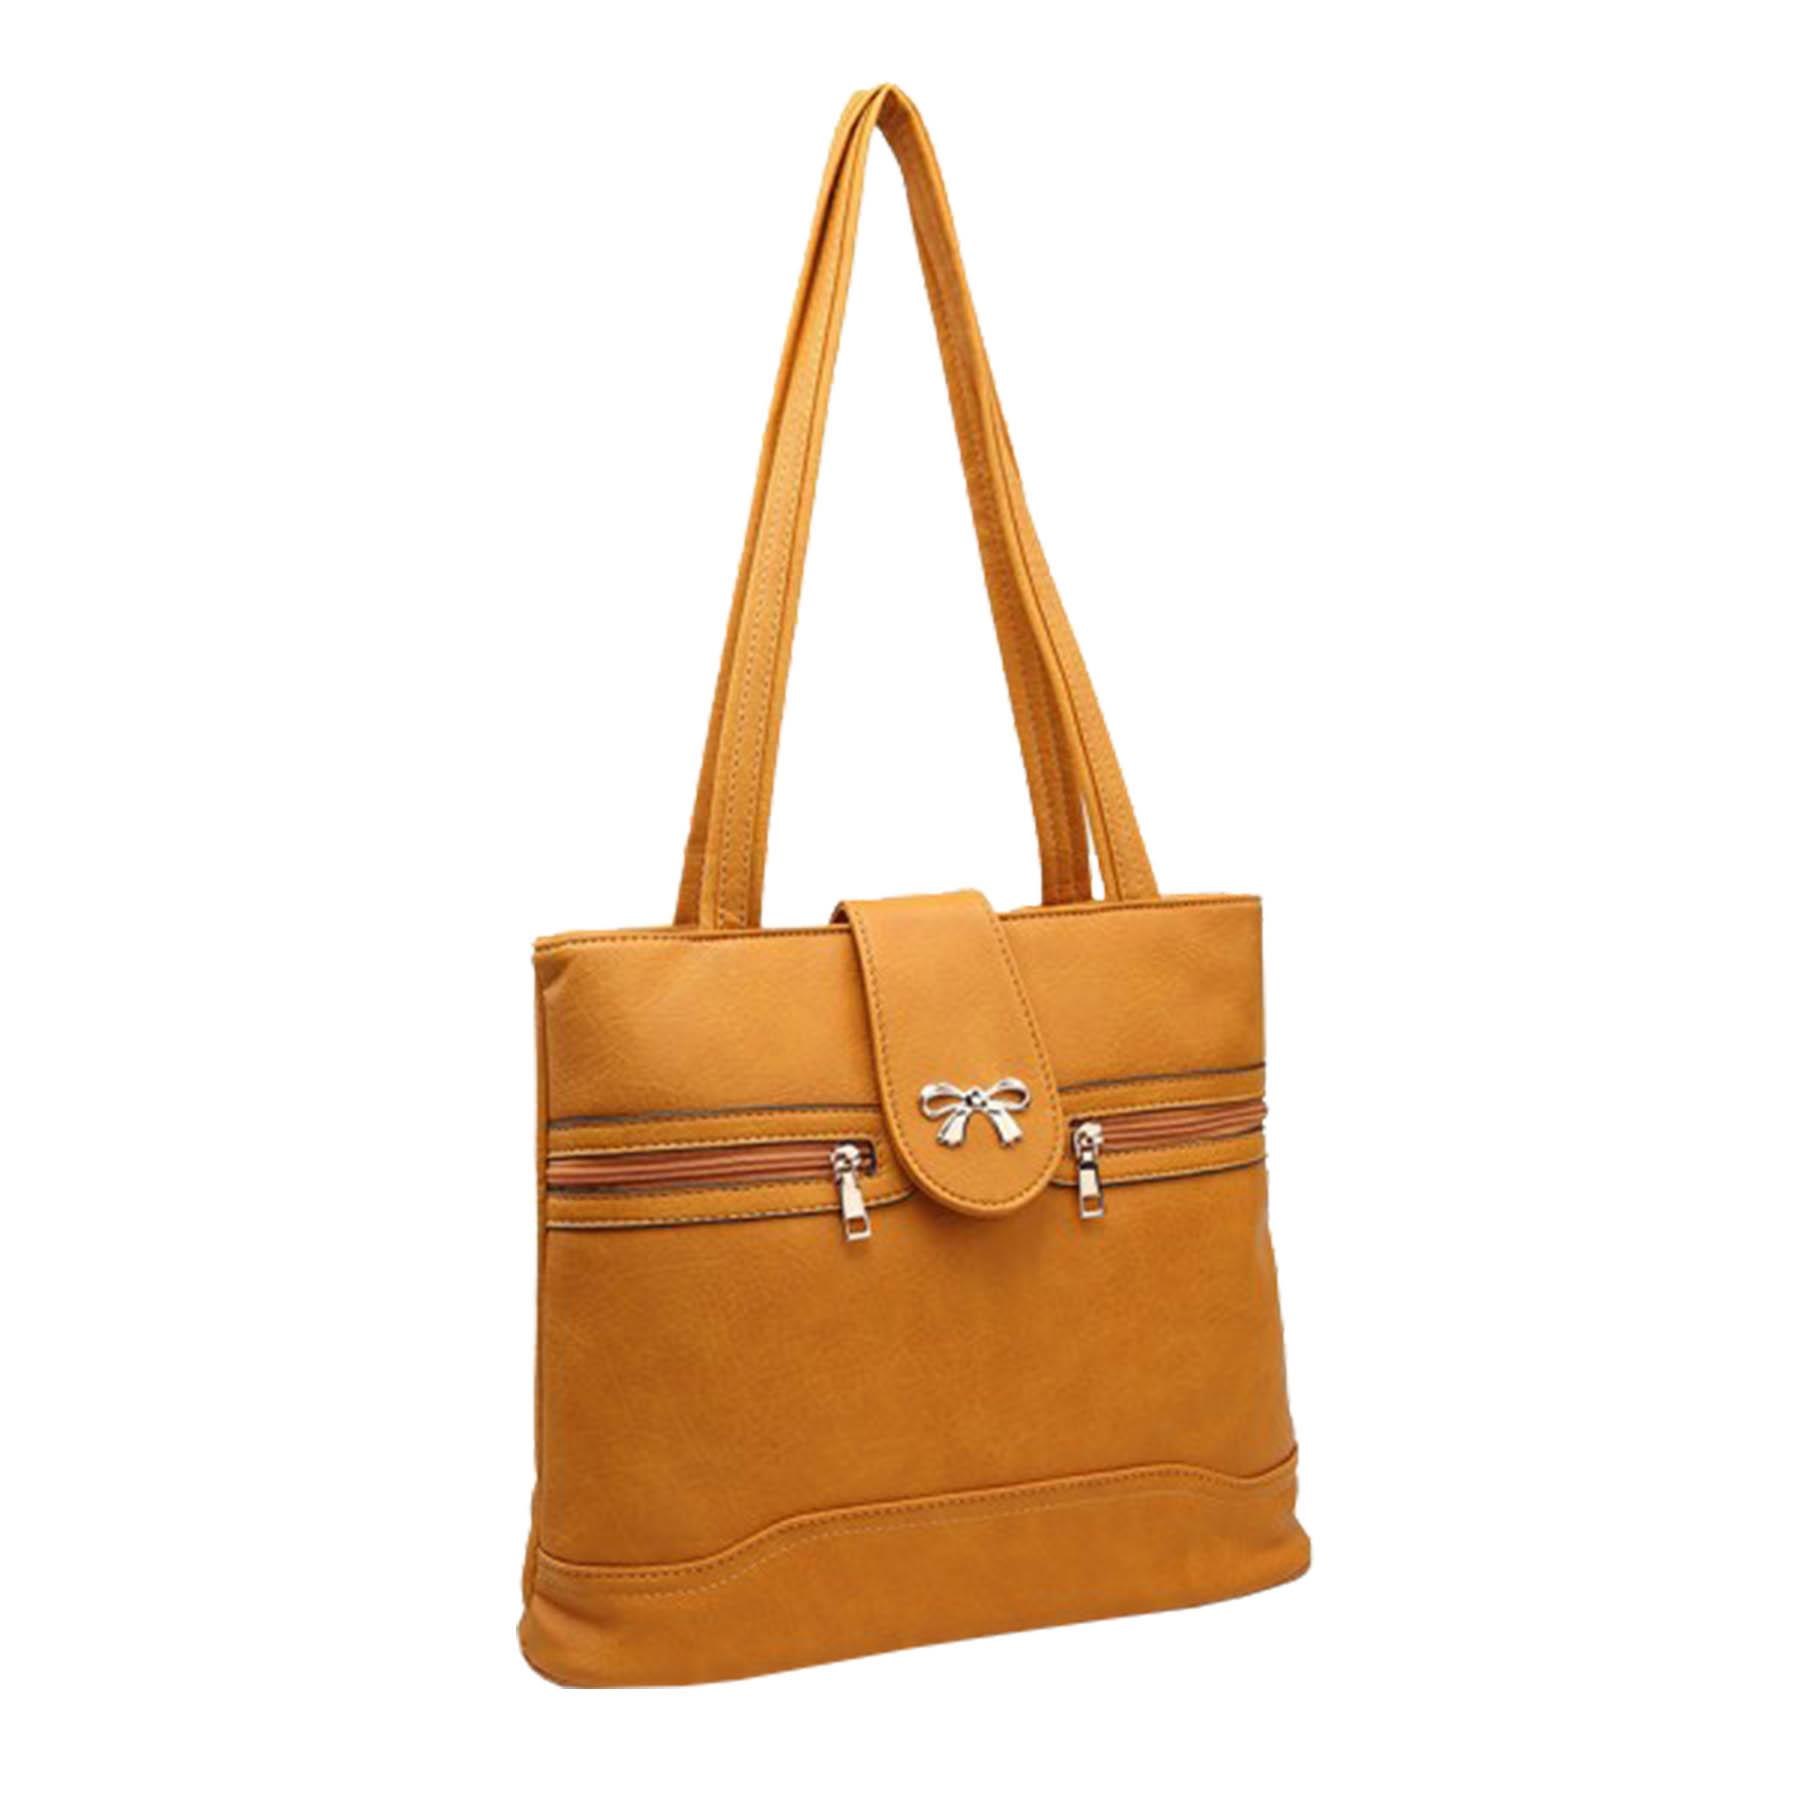 New-Women-s-Metallic-Bow-Decoration-Faux-Leather-Shopper-Shoulder-Tote-Bag thumbnail 8